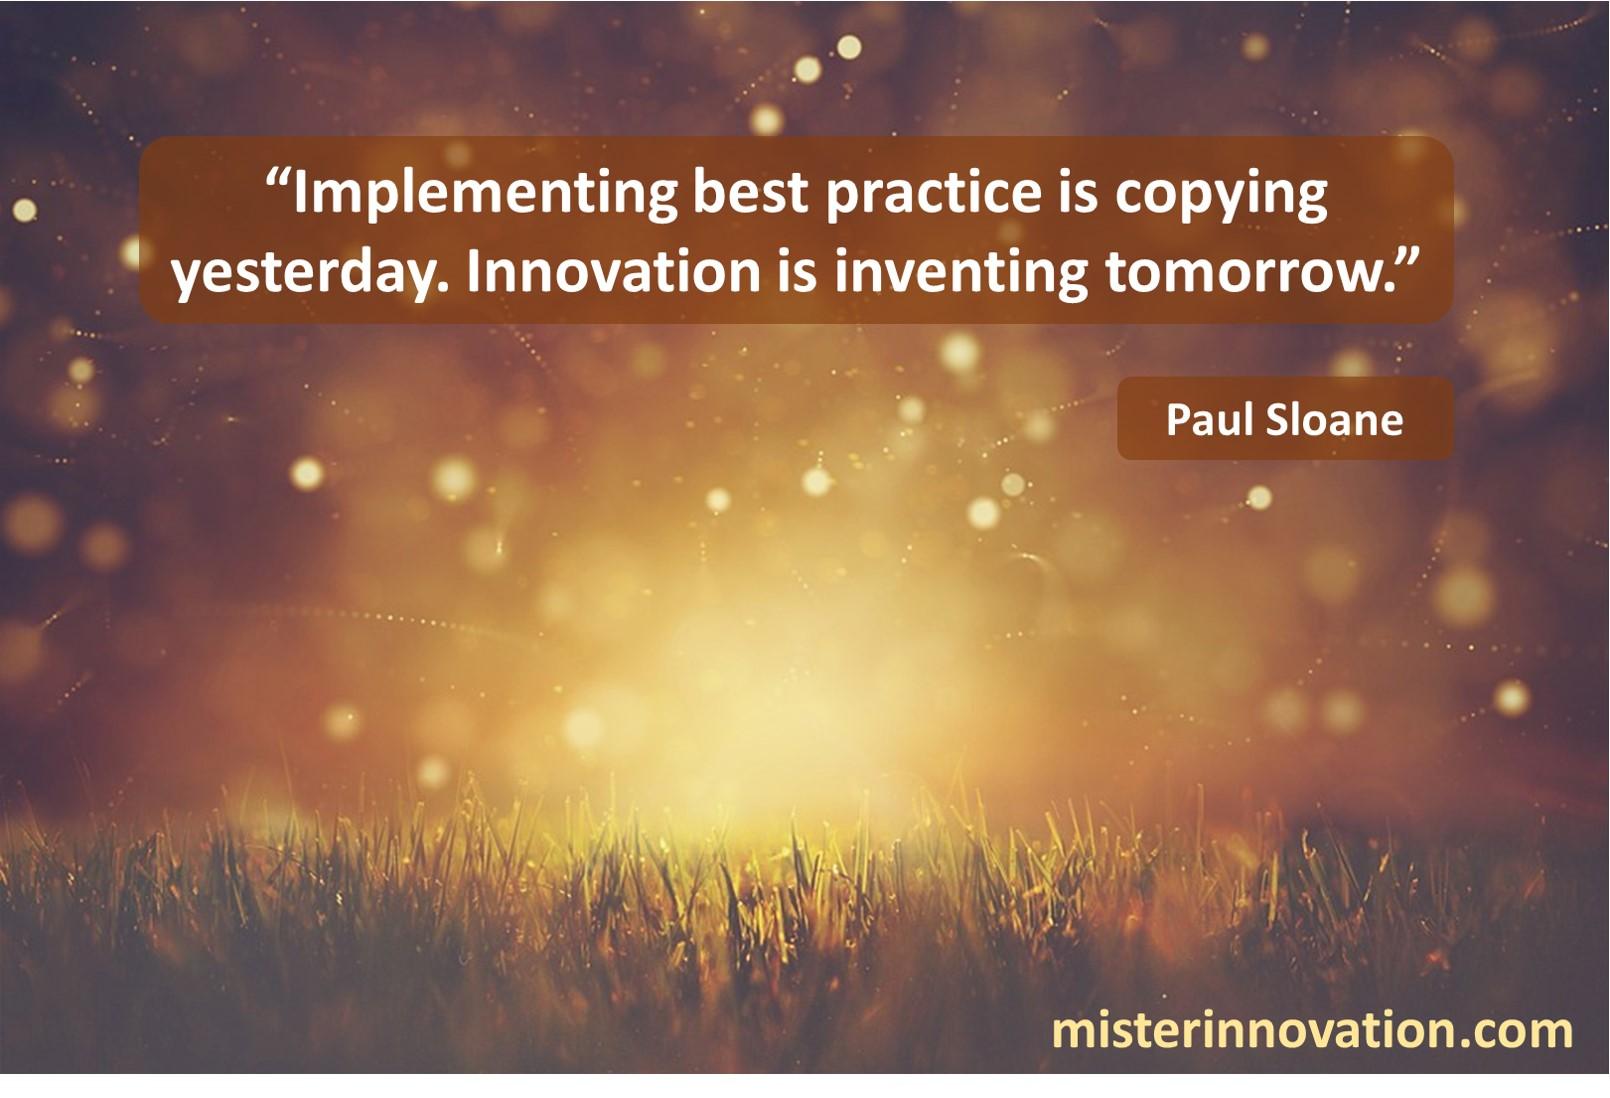 Paul Sloane Best Practice